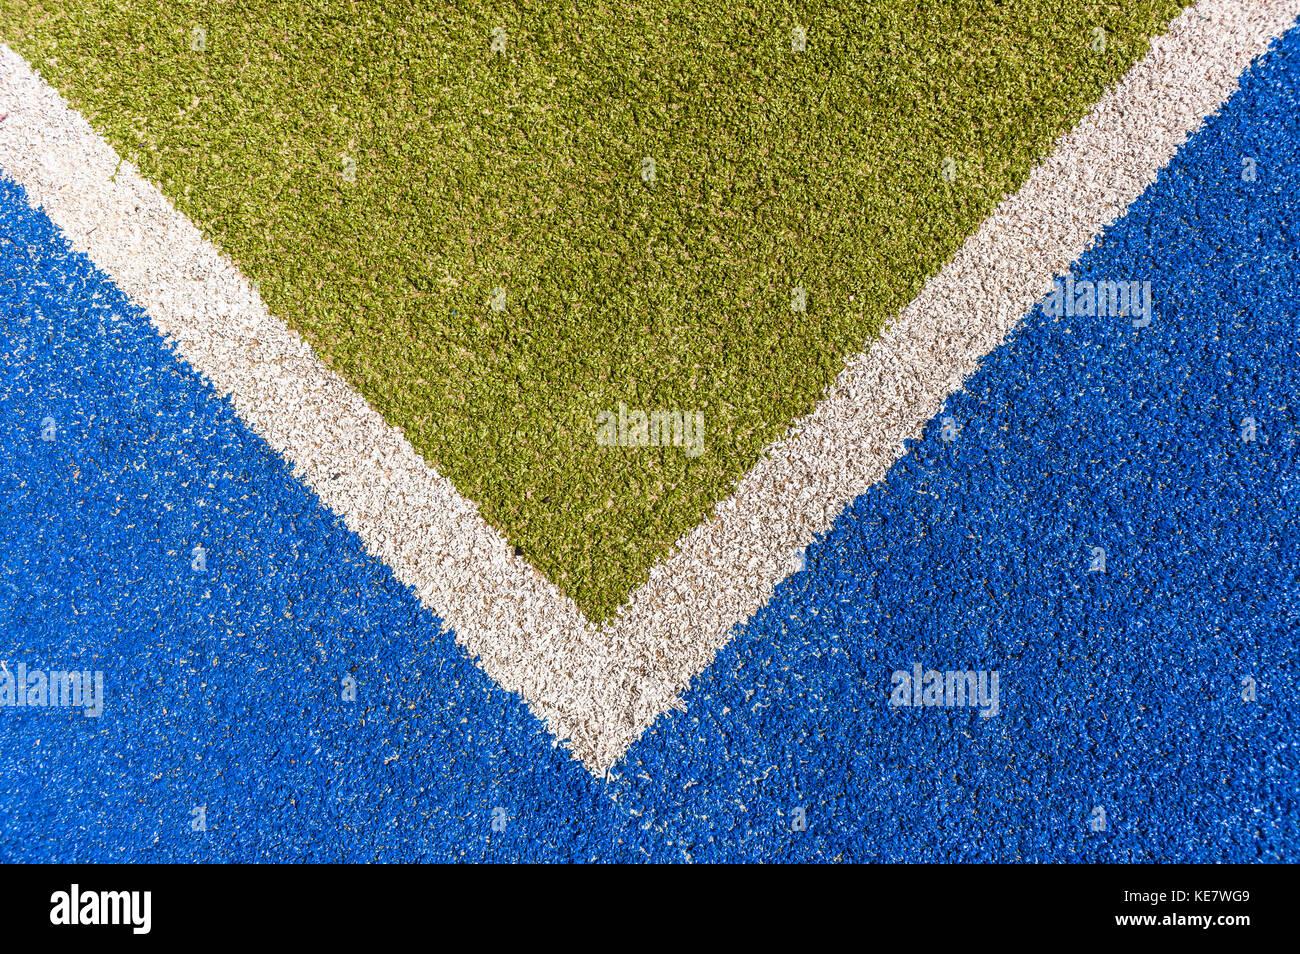 https://c8.alamy.com/comp/KE7WG9/sports-astro-synthetic-turf-field-closeup-corner-boundary-white-line-KE7WG9.jpg